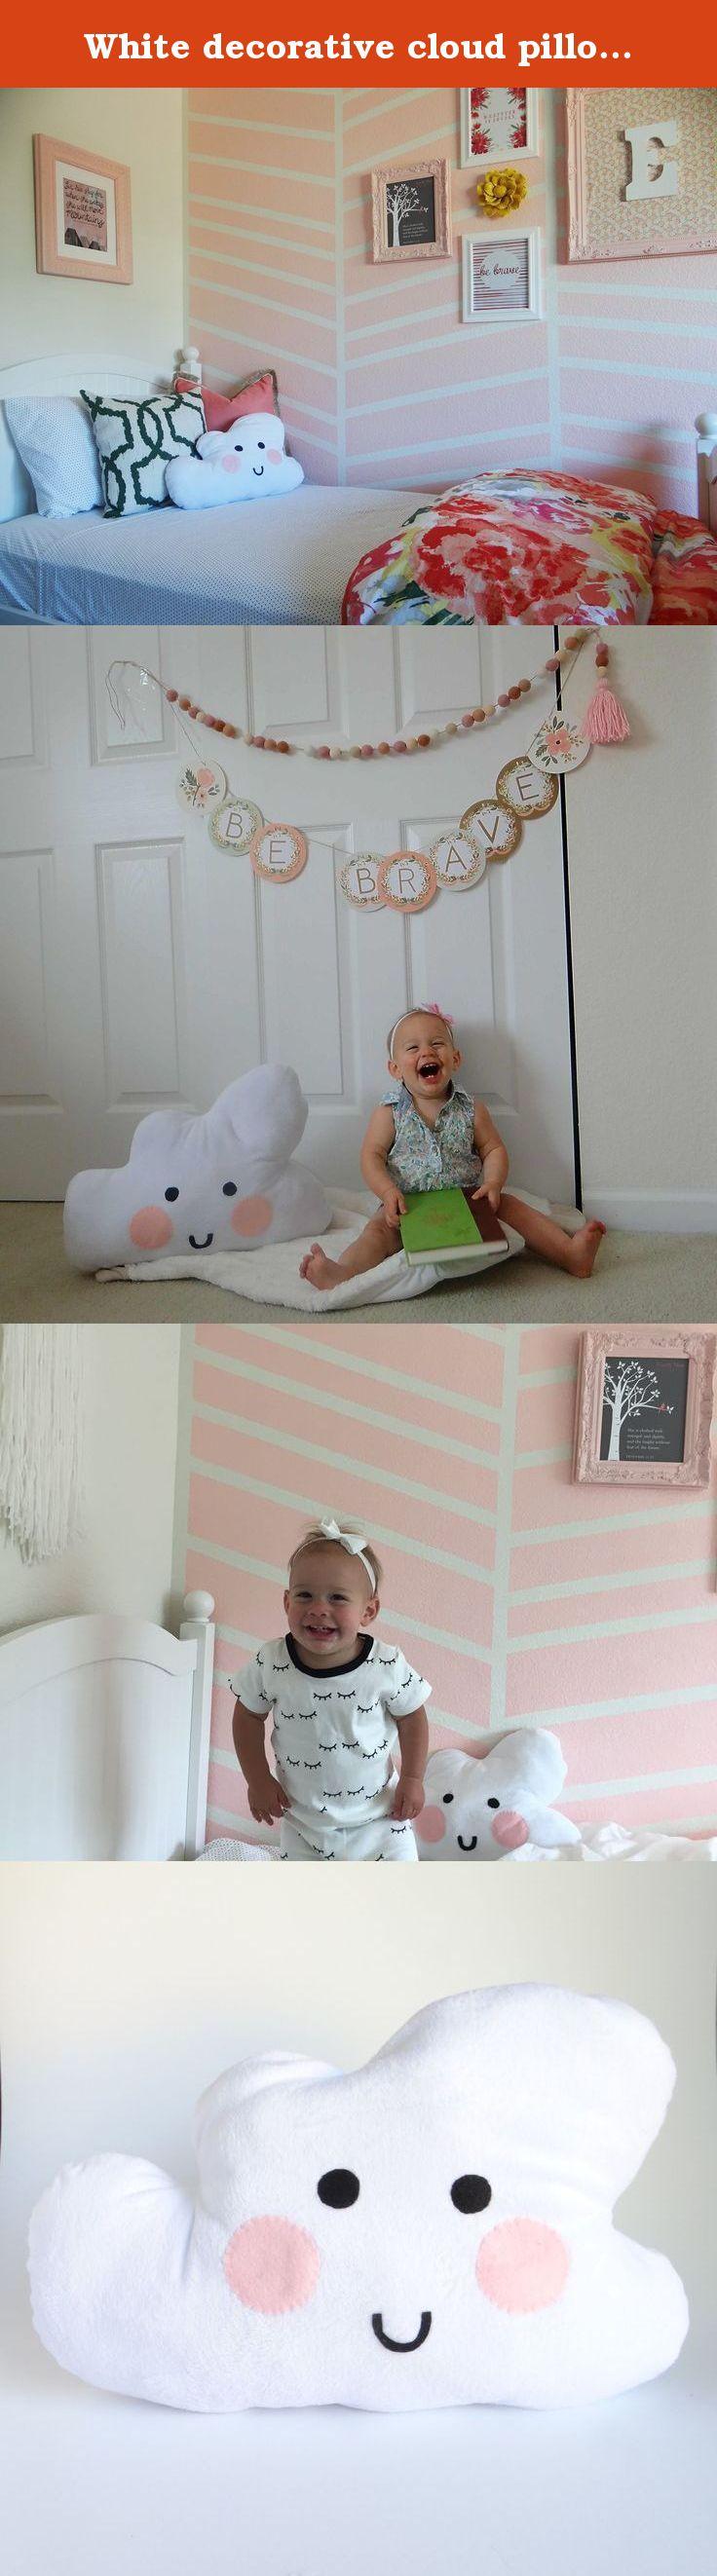 Crib pillows babies - White Decorative Cloud Pillow With Smiley Face Nursery Decor Crib Bedding Baby Shower Gift Throw Pillow